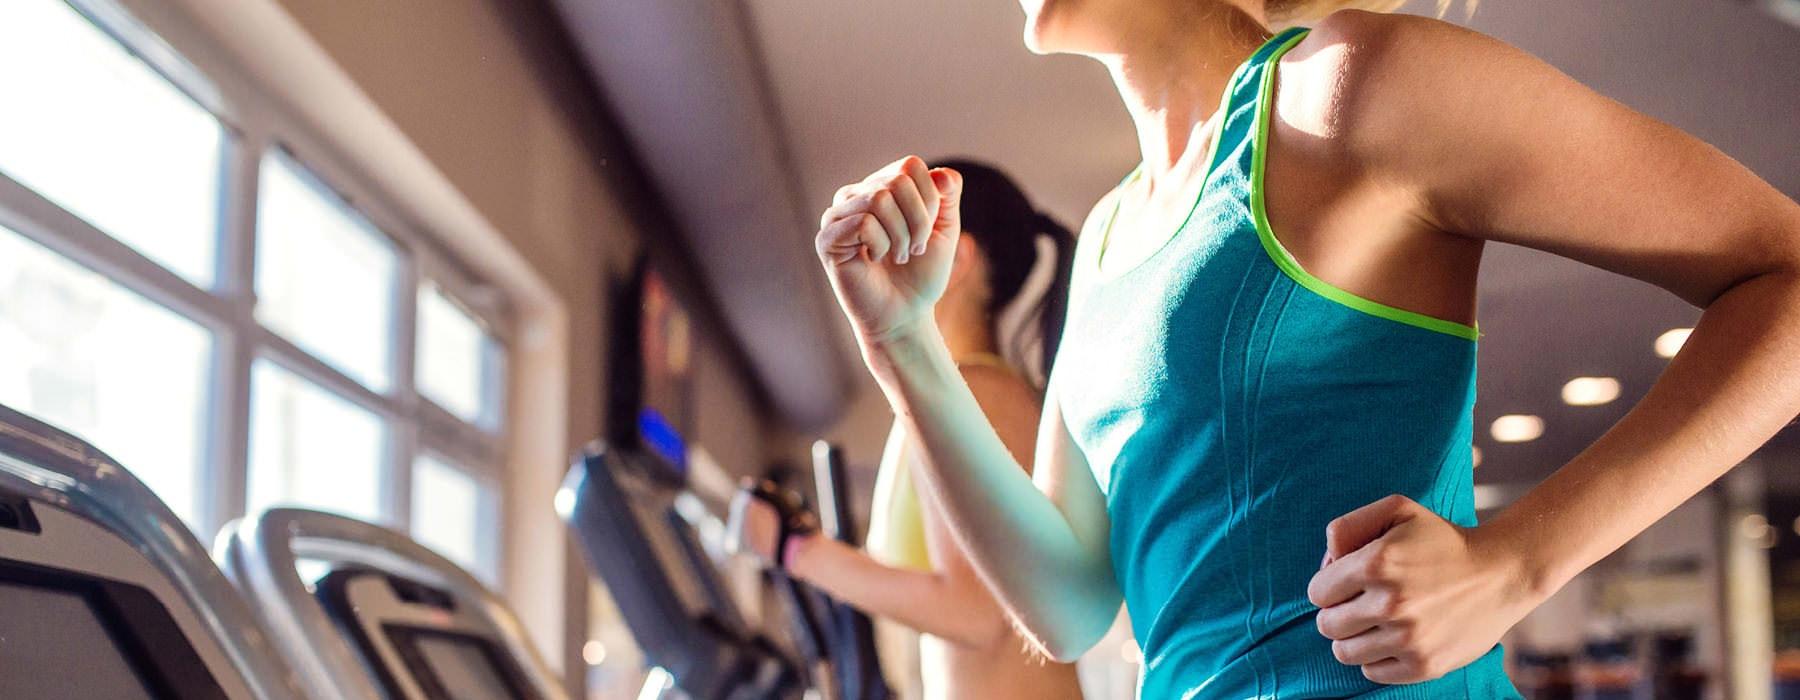 people running on treadmills in bright fitness center